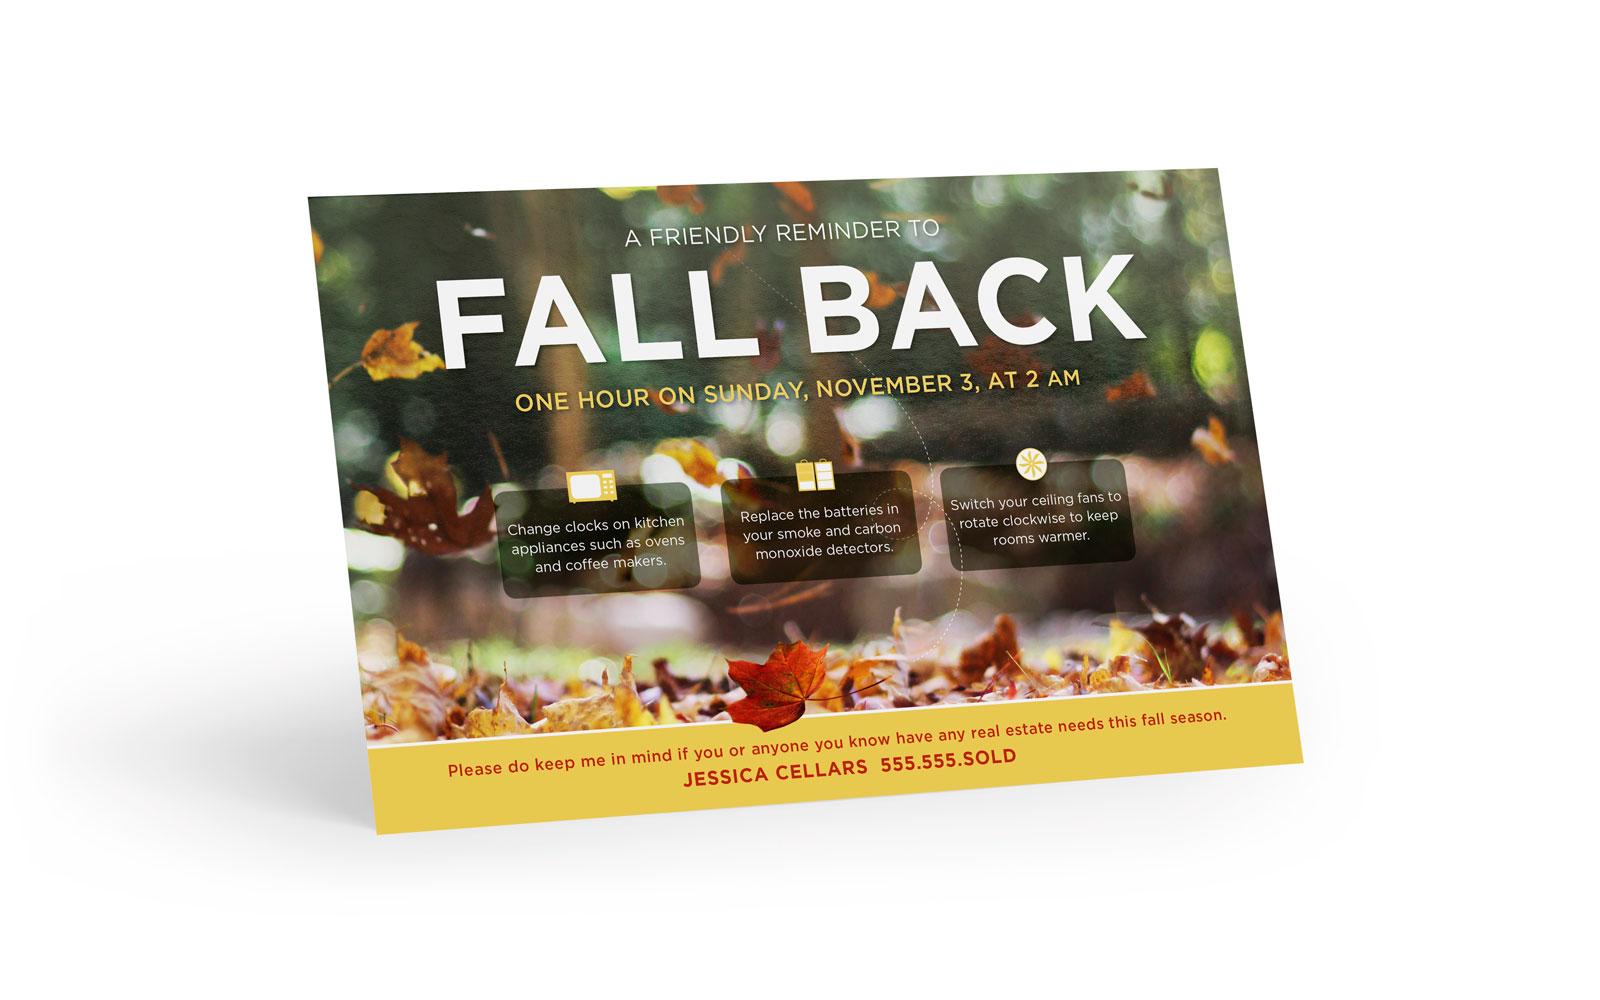 Corefact Seasonal - Fall Back Reminder